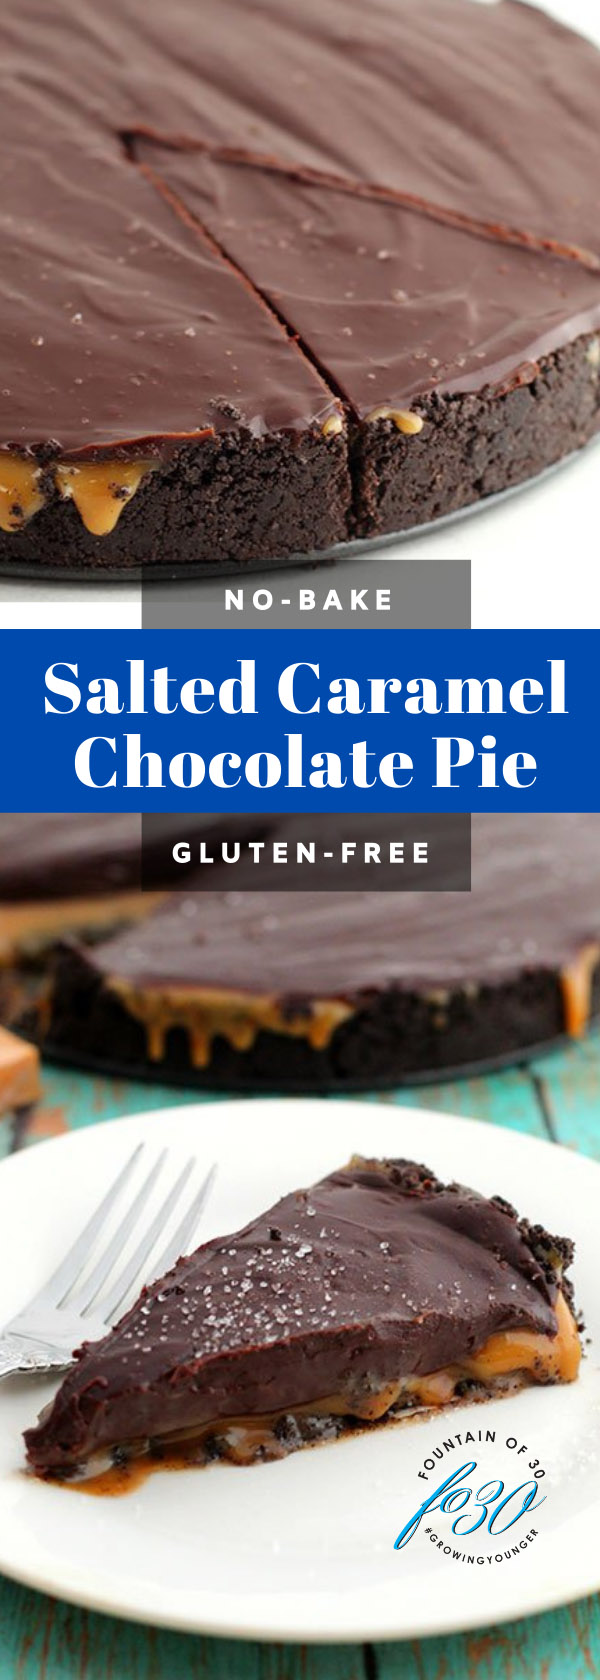 no-bake salted caramel chocolate pie fountainofd30